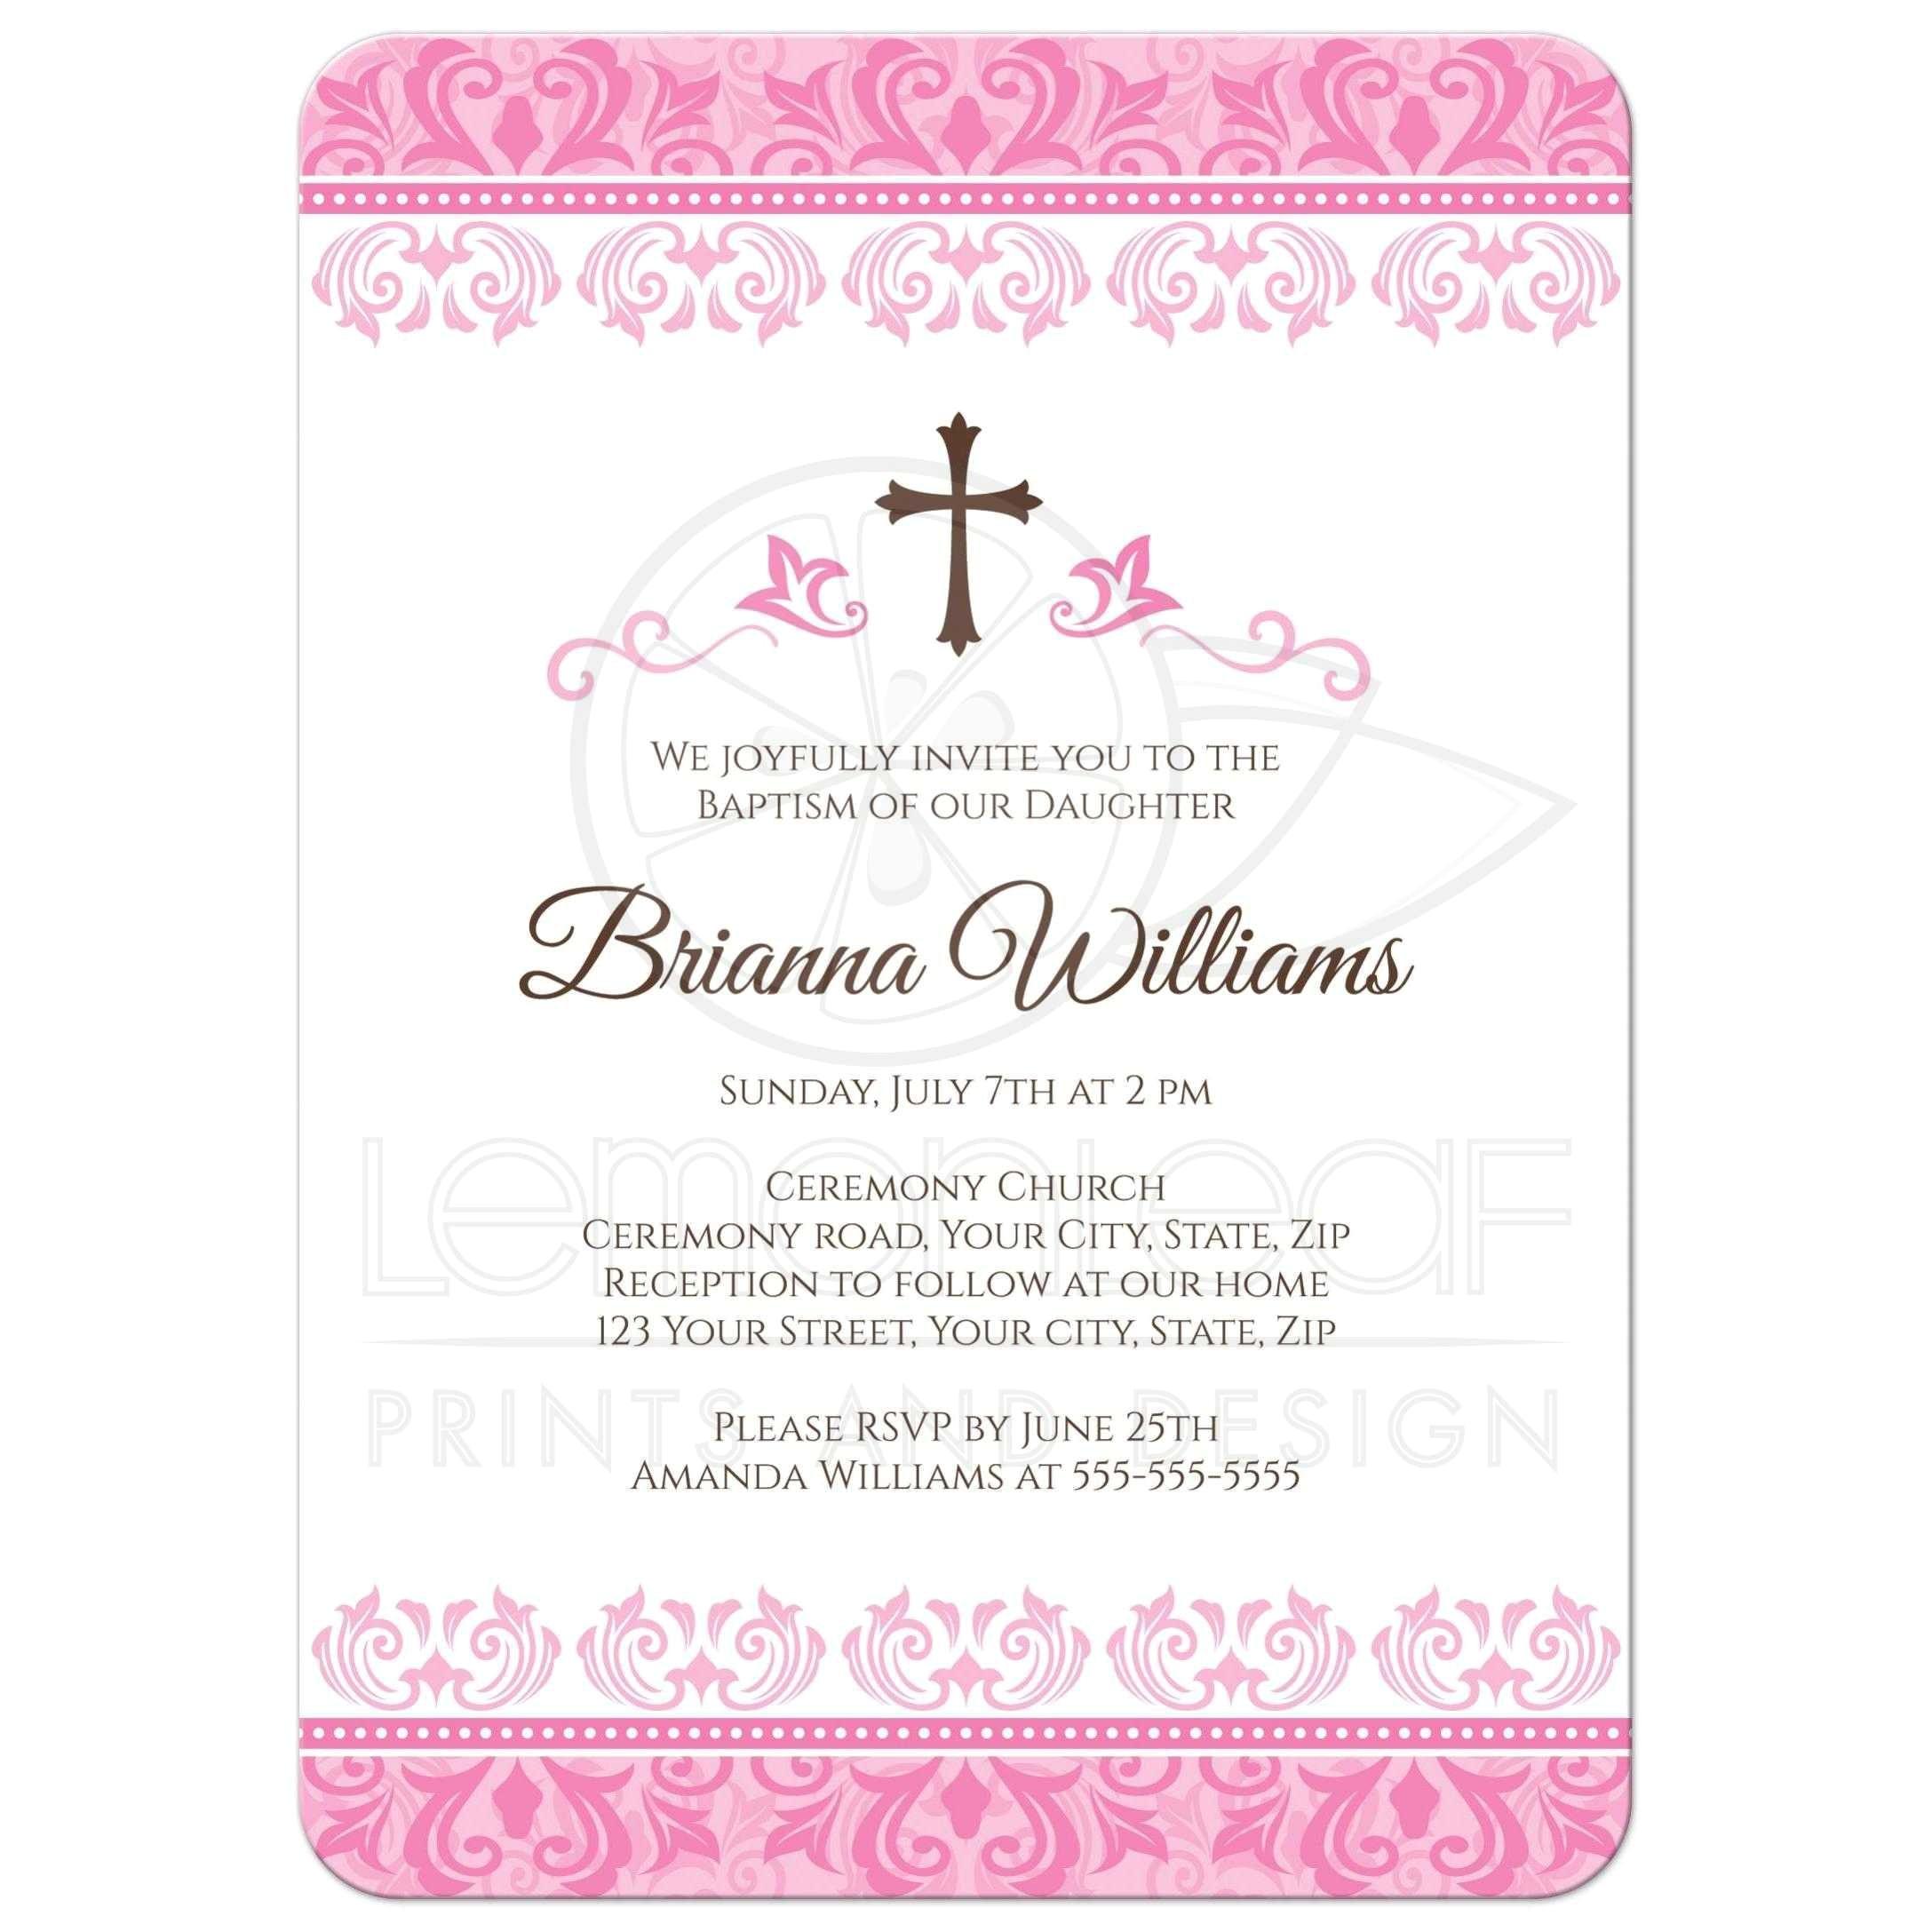 Bible Verses for Baptism Invitations Baptism Invitation Wording Bible Verses